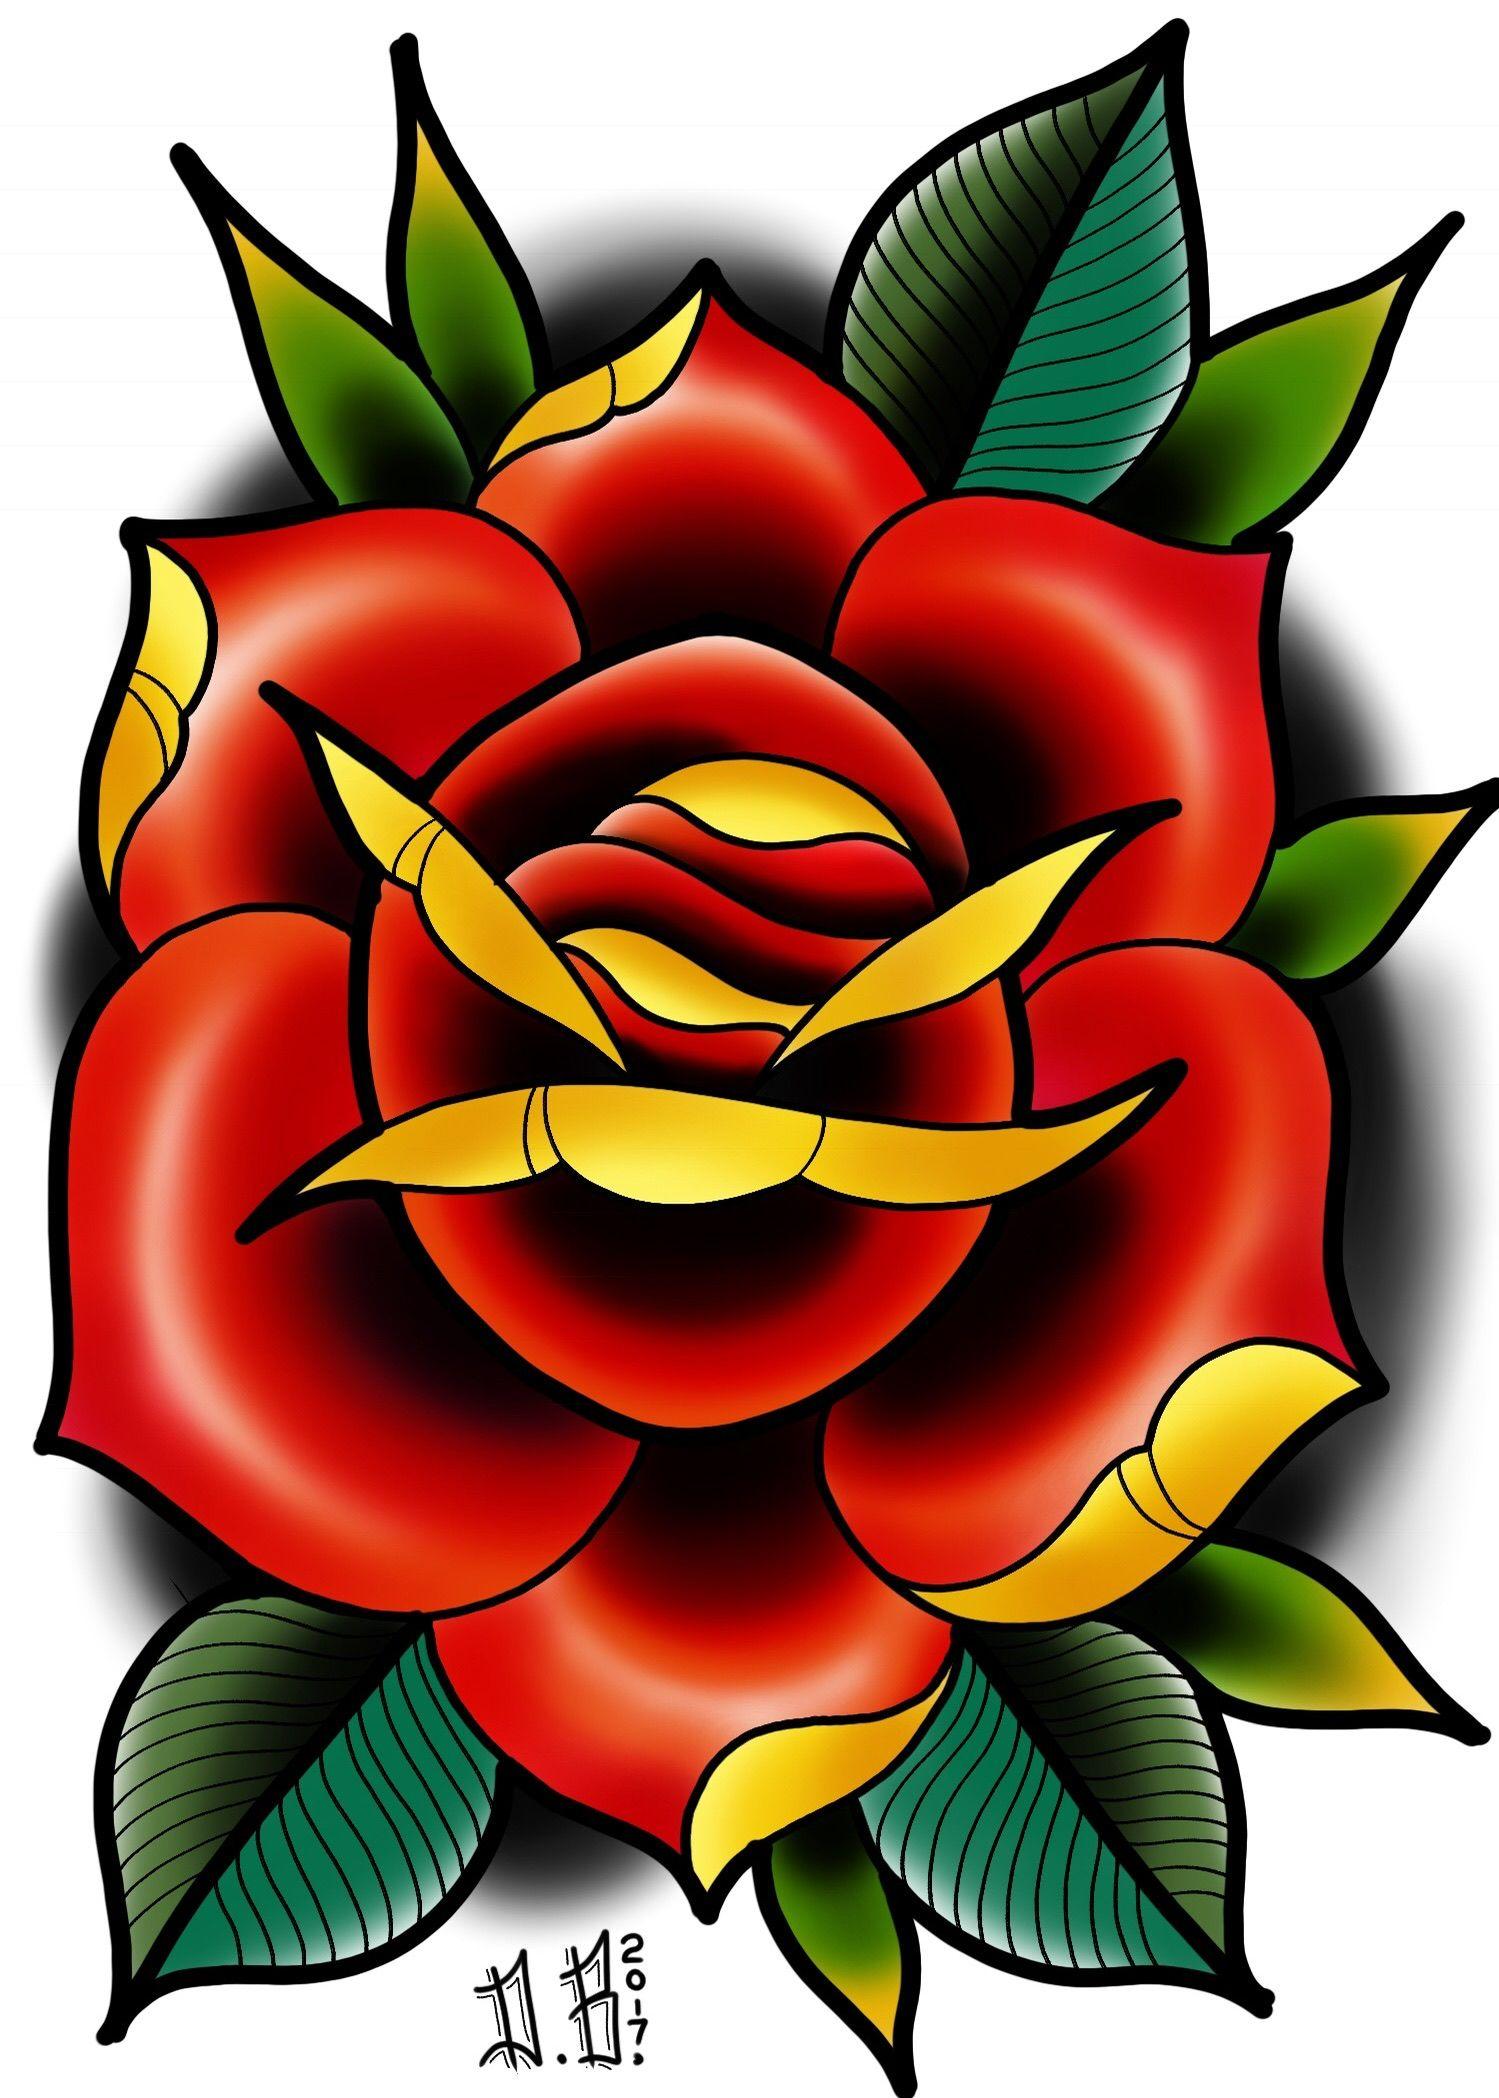 Rose tattoo flash by darin blank instagram darinblanktattoos my rose tattoo flash by darin blank instagram darinblanktattoos old tattoos life tattoos izmirmasajfo